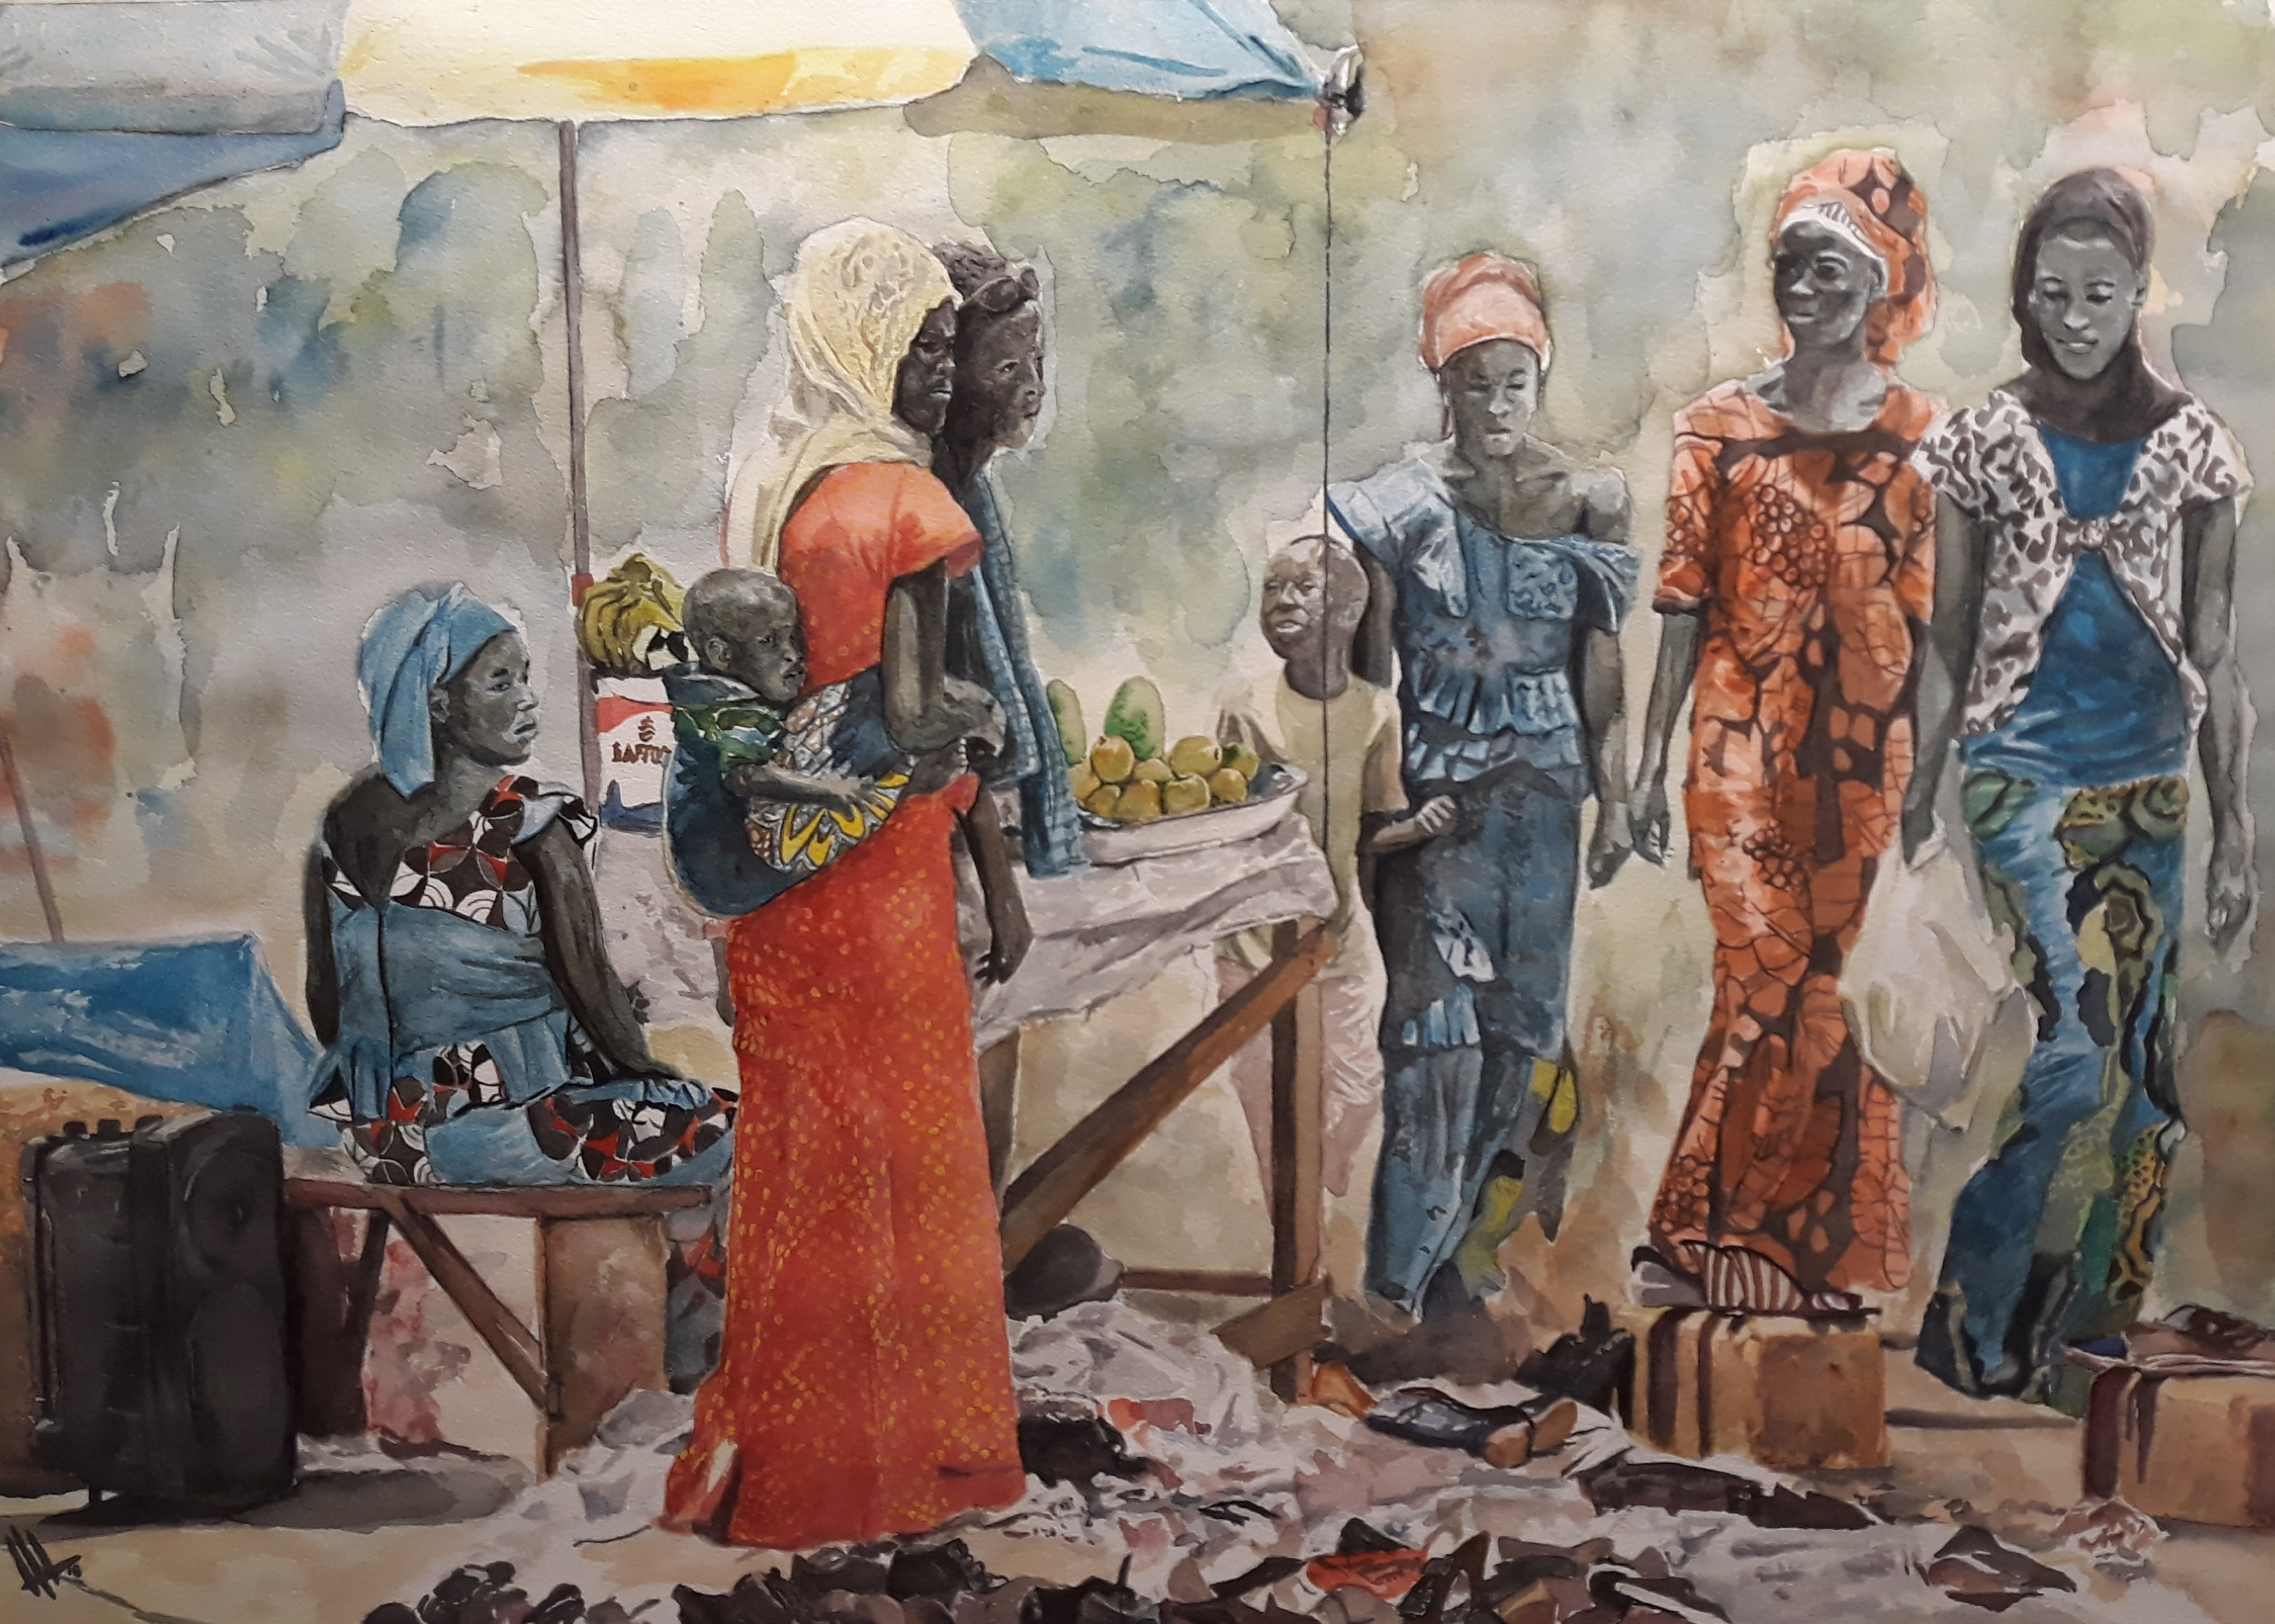 Venta callejera en Senegal